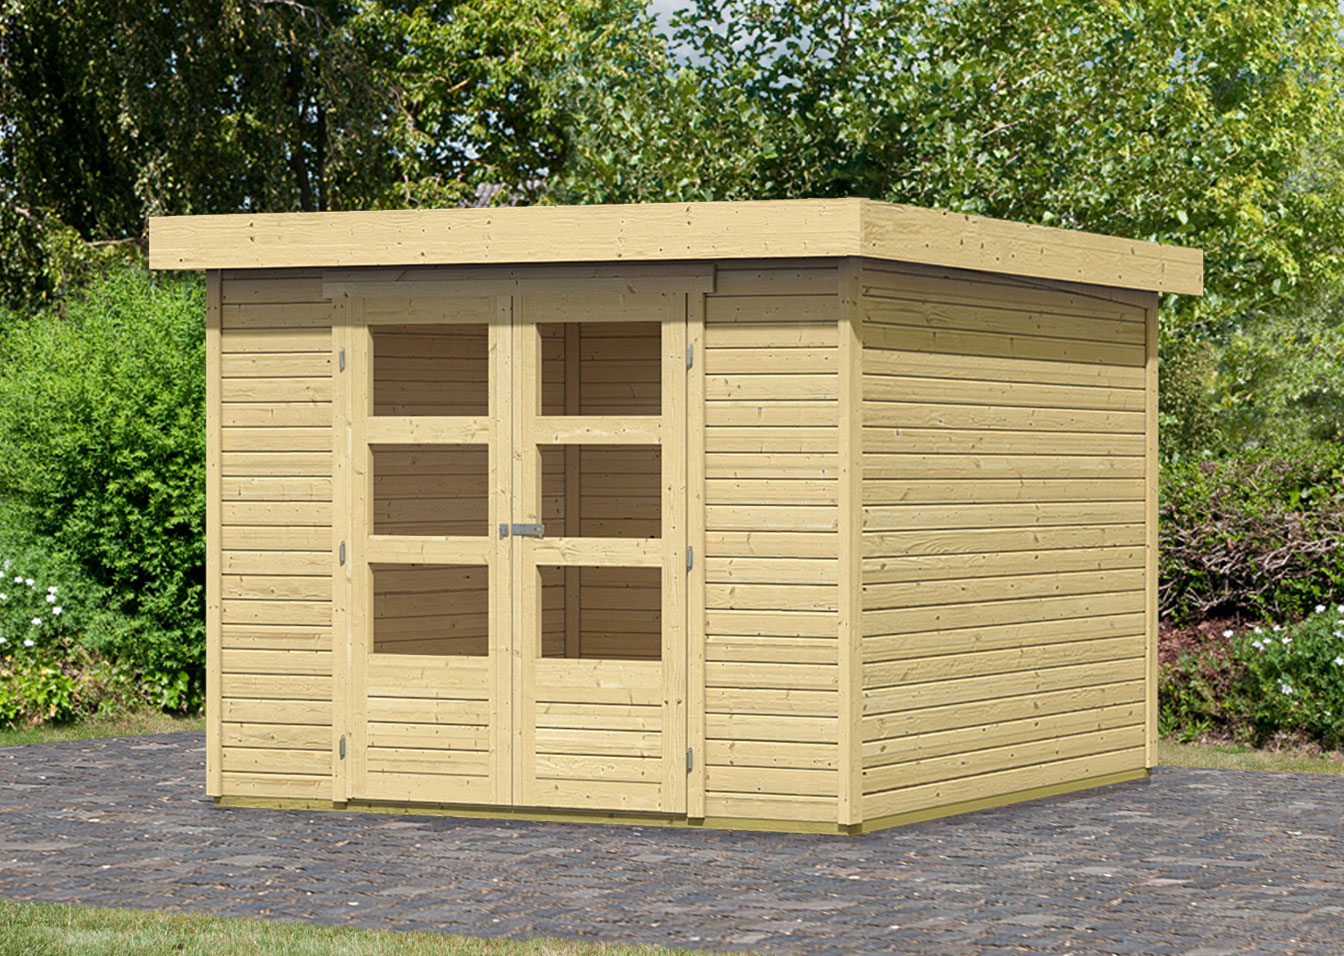 woodfeeling gartenhaus ger tehaus 19mm askola 4 natur 329x237cm bei. Black Bedroom Furniture Sets. Home Design Ideas